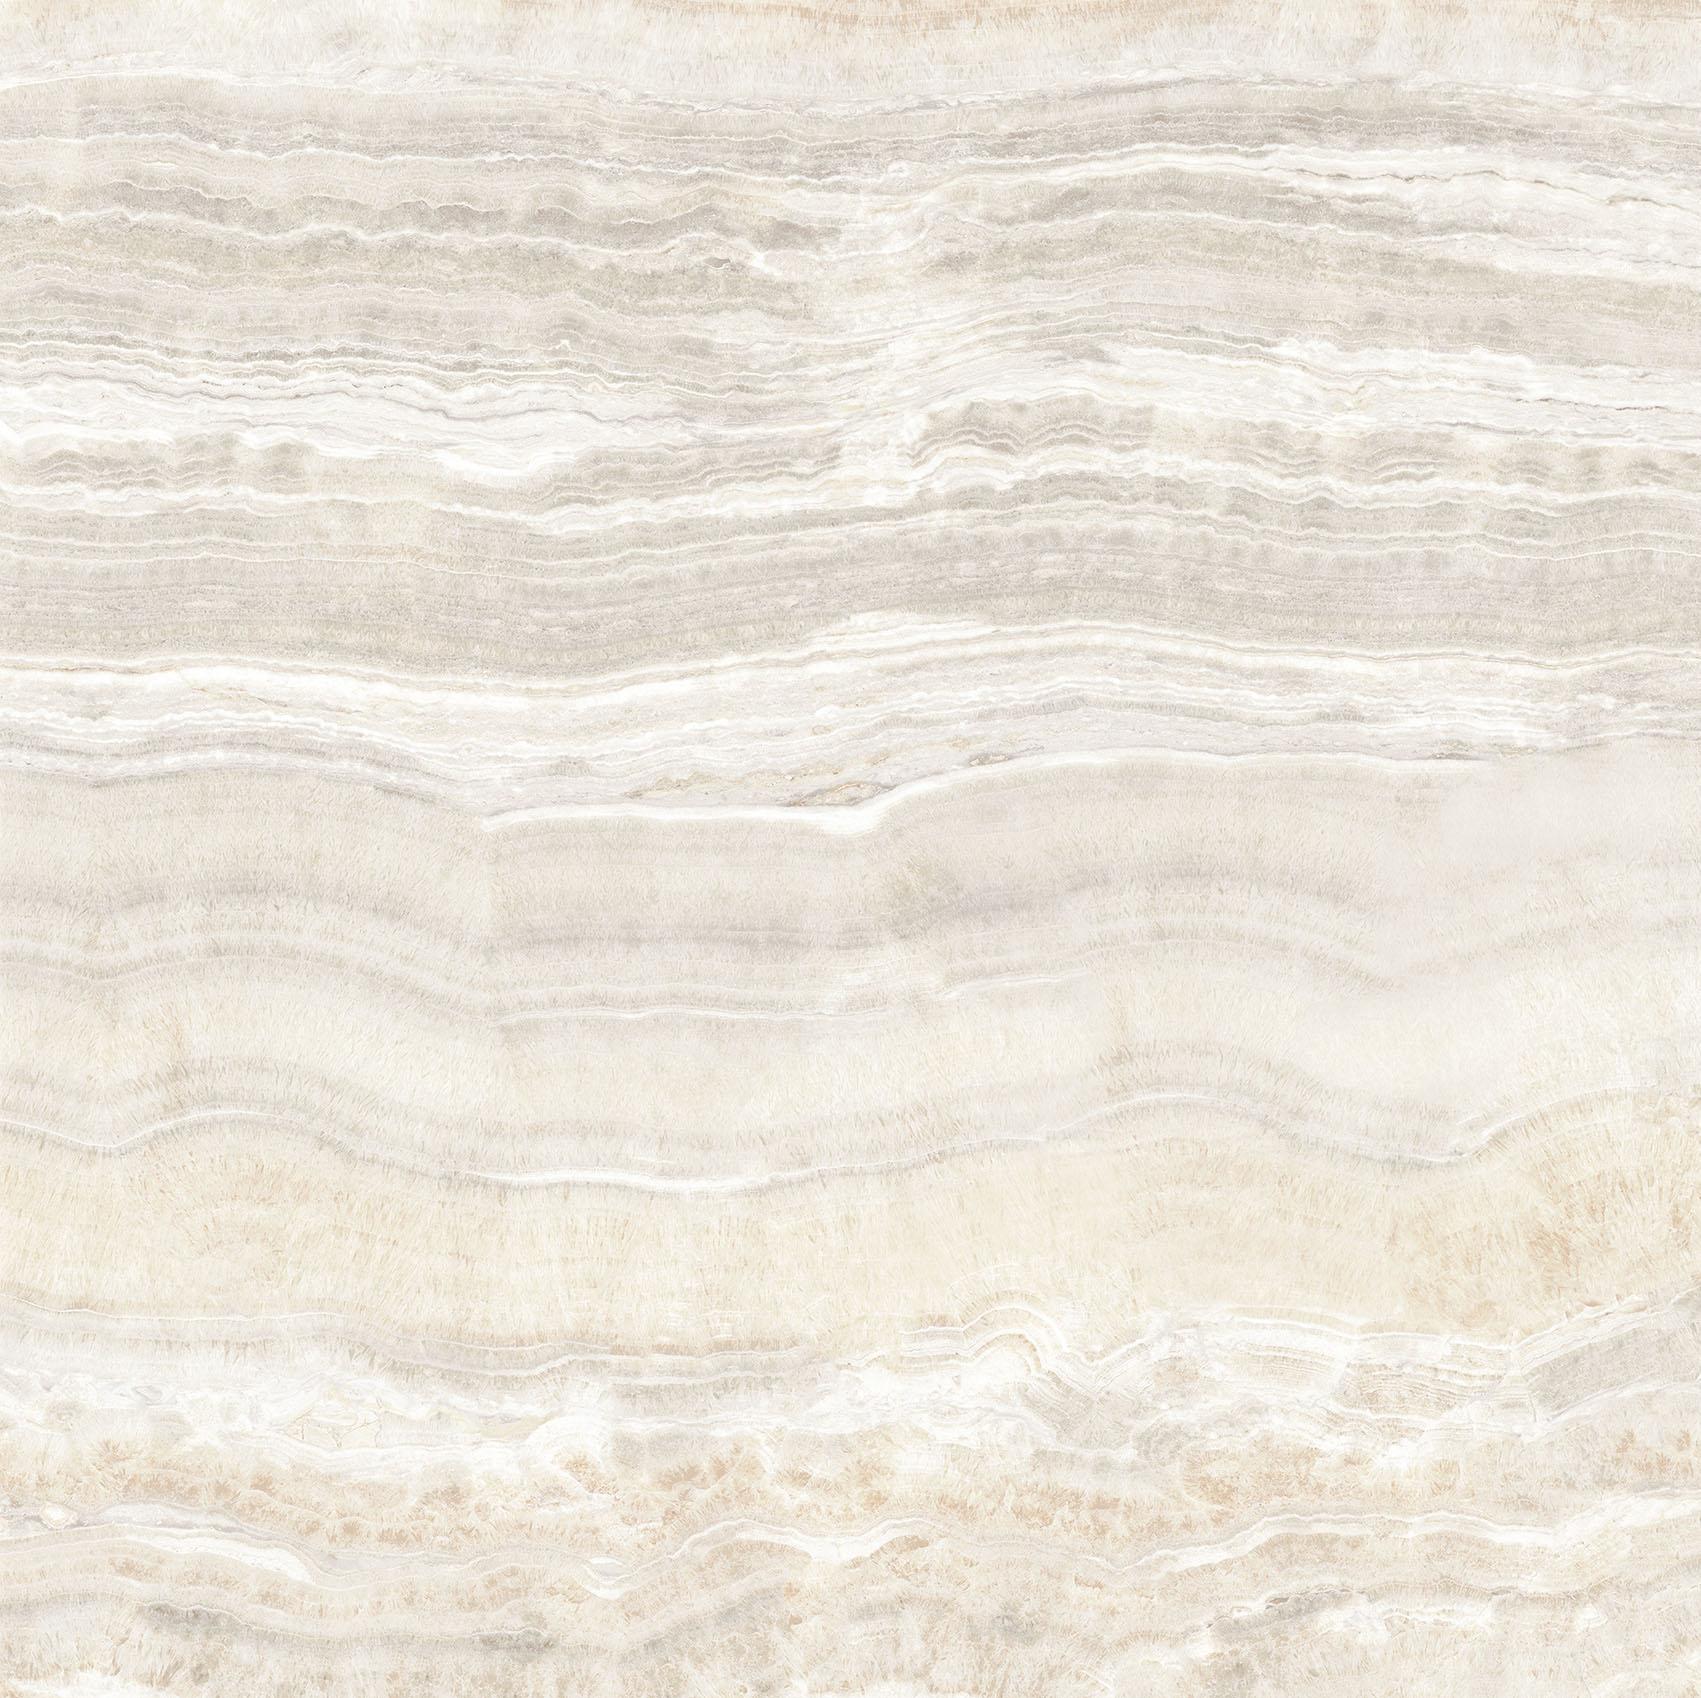 Onyx of Cerim Sand Glossy 10mm 60 x 60